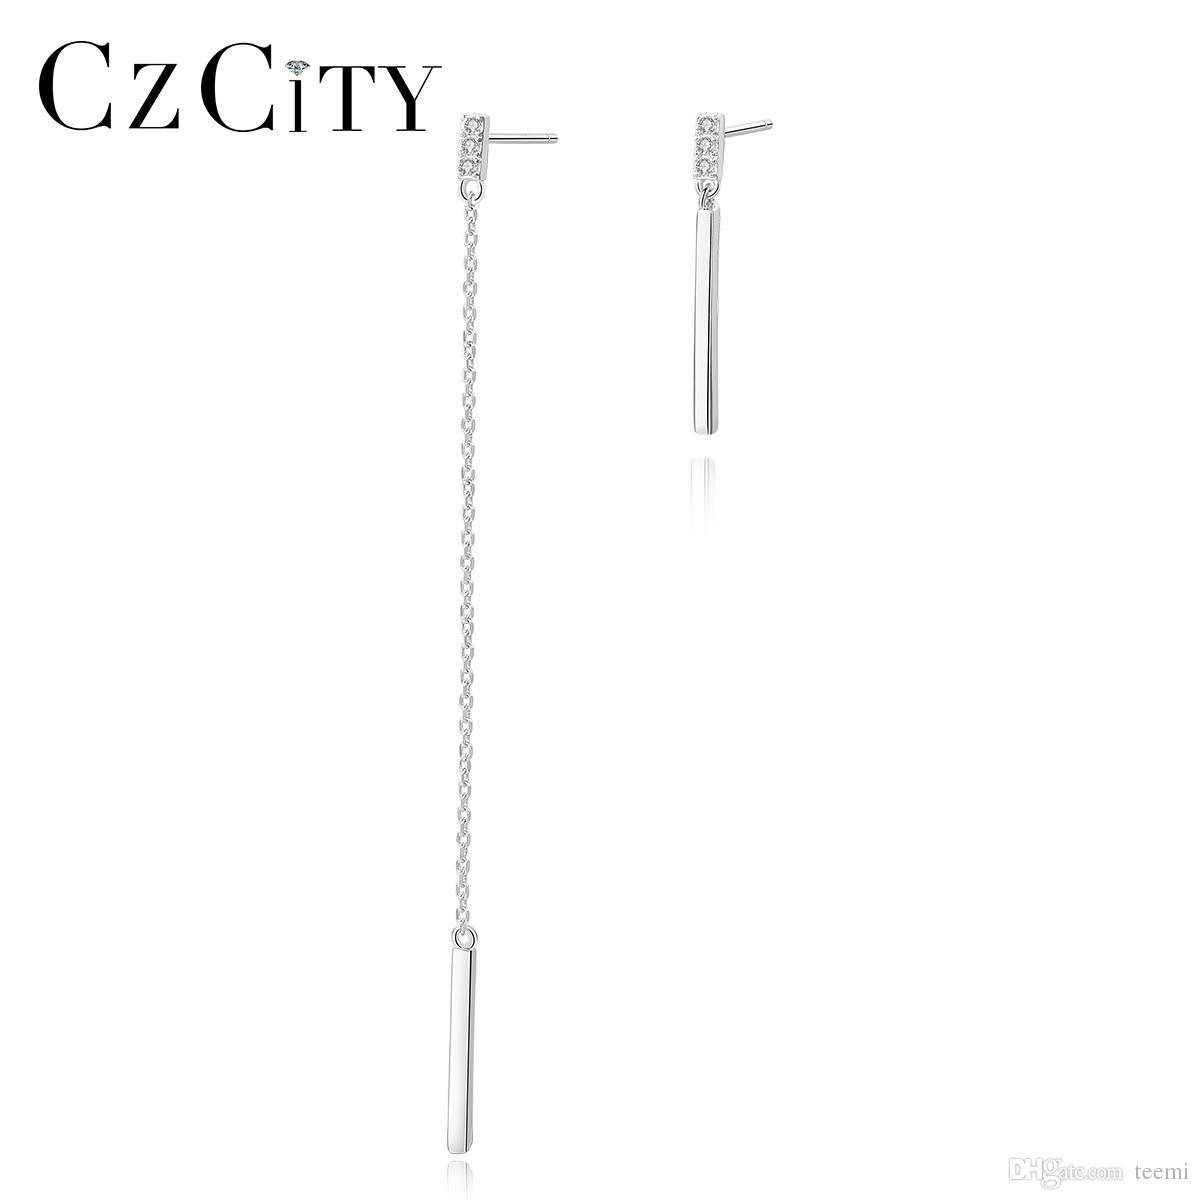 CZCITY New Unique 925 Sterling Silver Tassel Drop Earrings for Women Elegant Chain Fine Prom Jewelry Bijoux Christmas Gifts